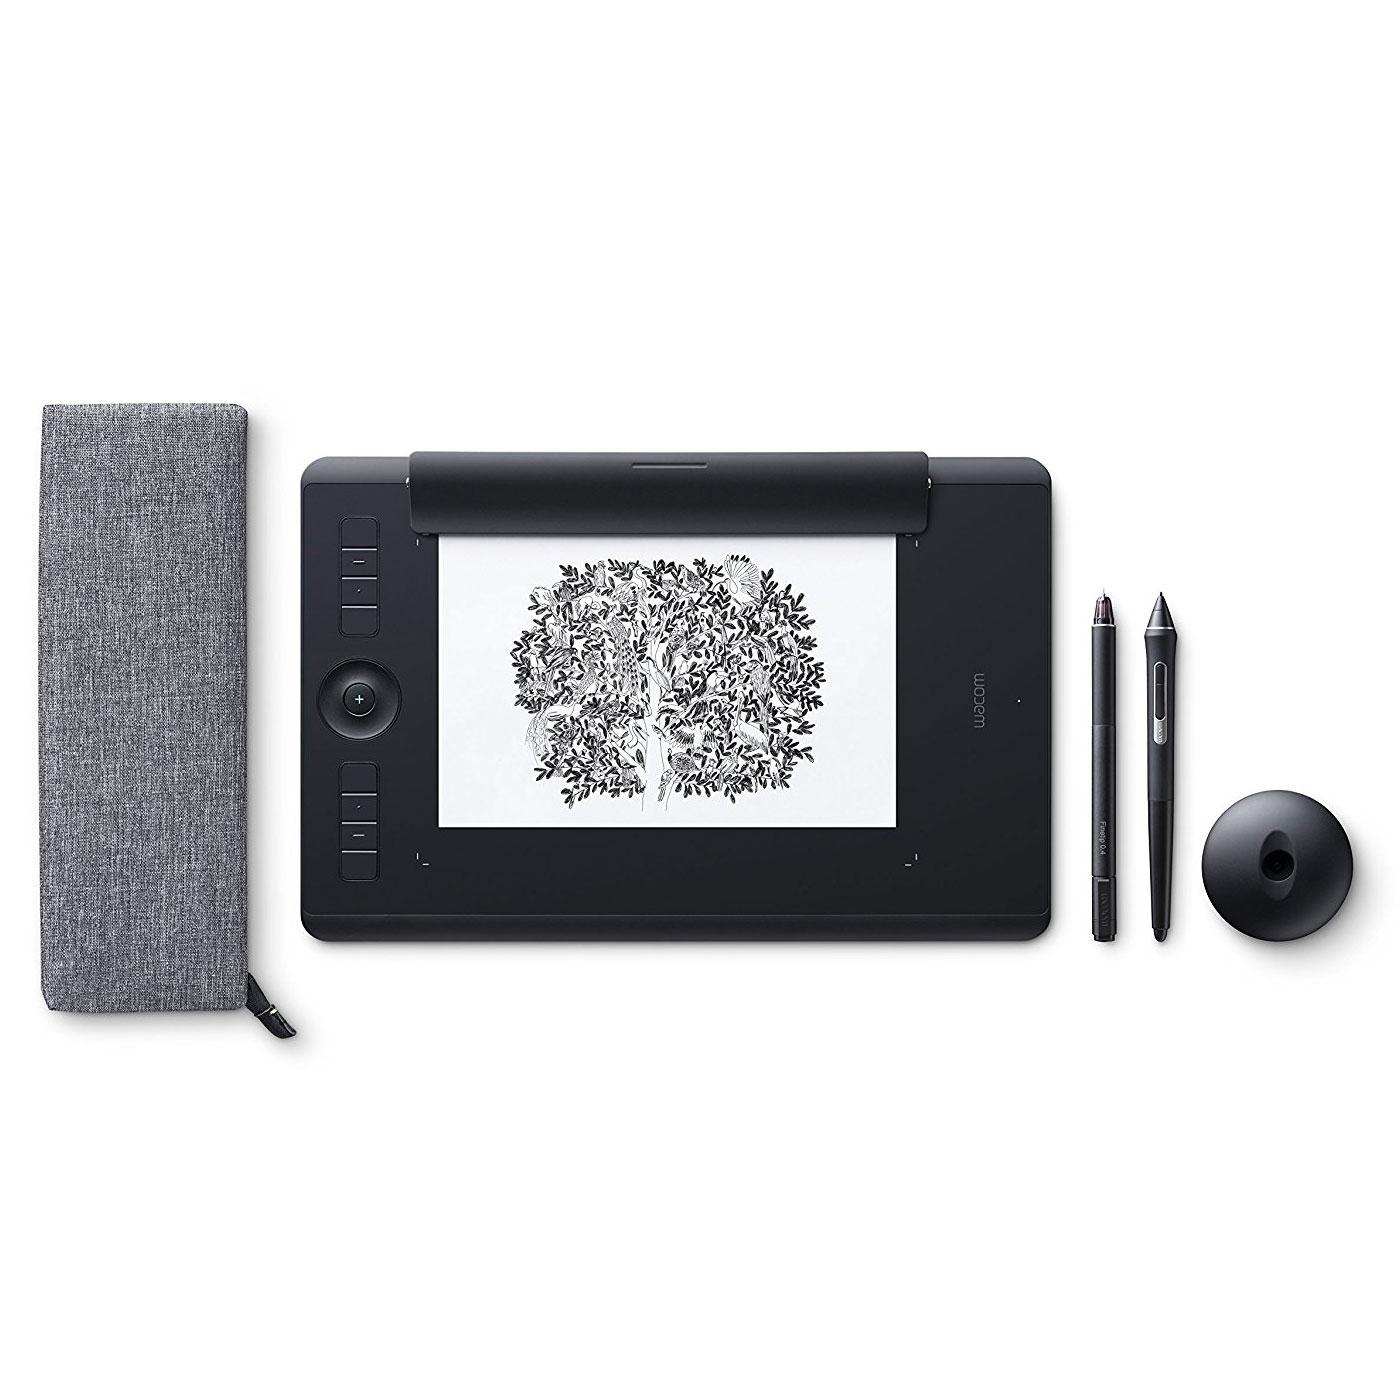 wacom intuos pro large paper edition tablette graphique. Black Bedroom Furniture Sets. Home Design Ideas